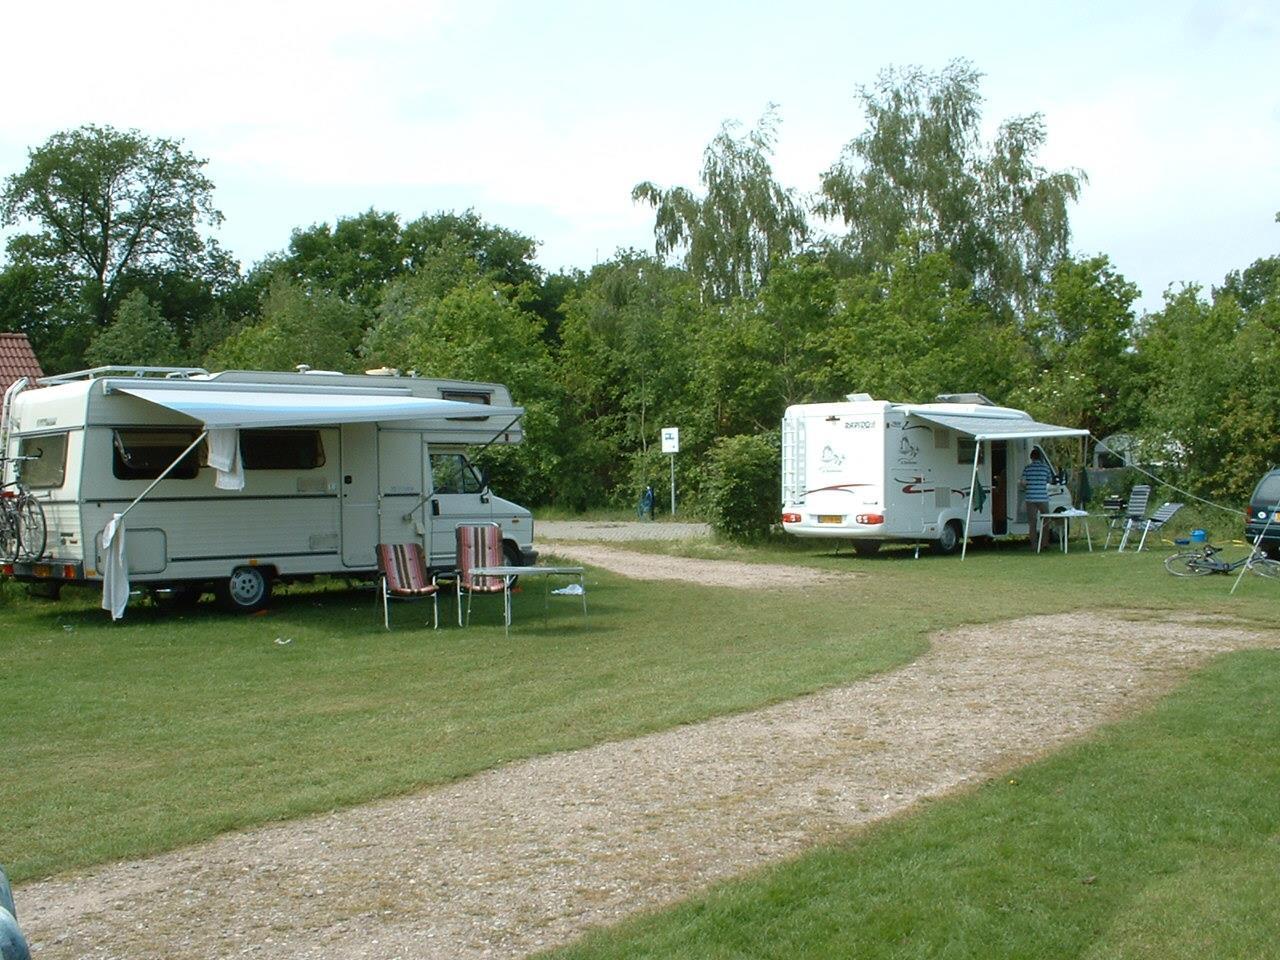 Camping De Vinkenkamp